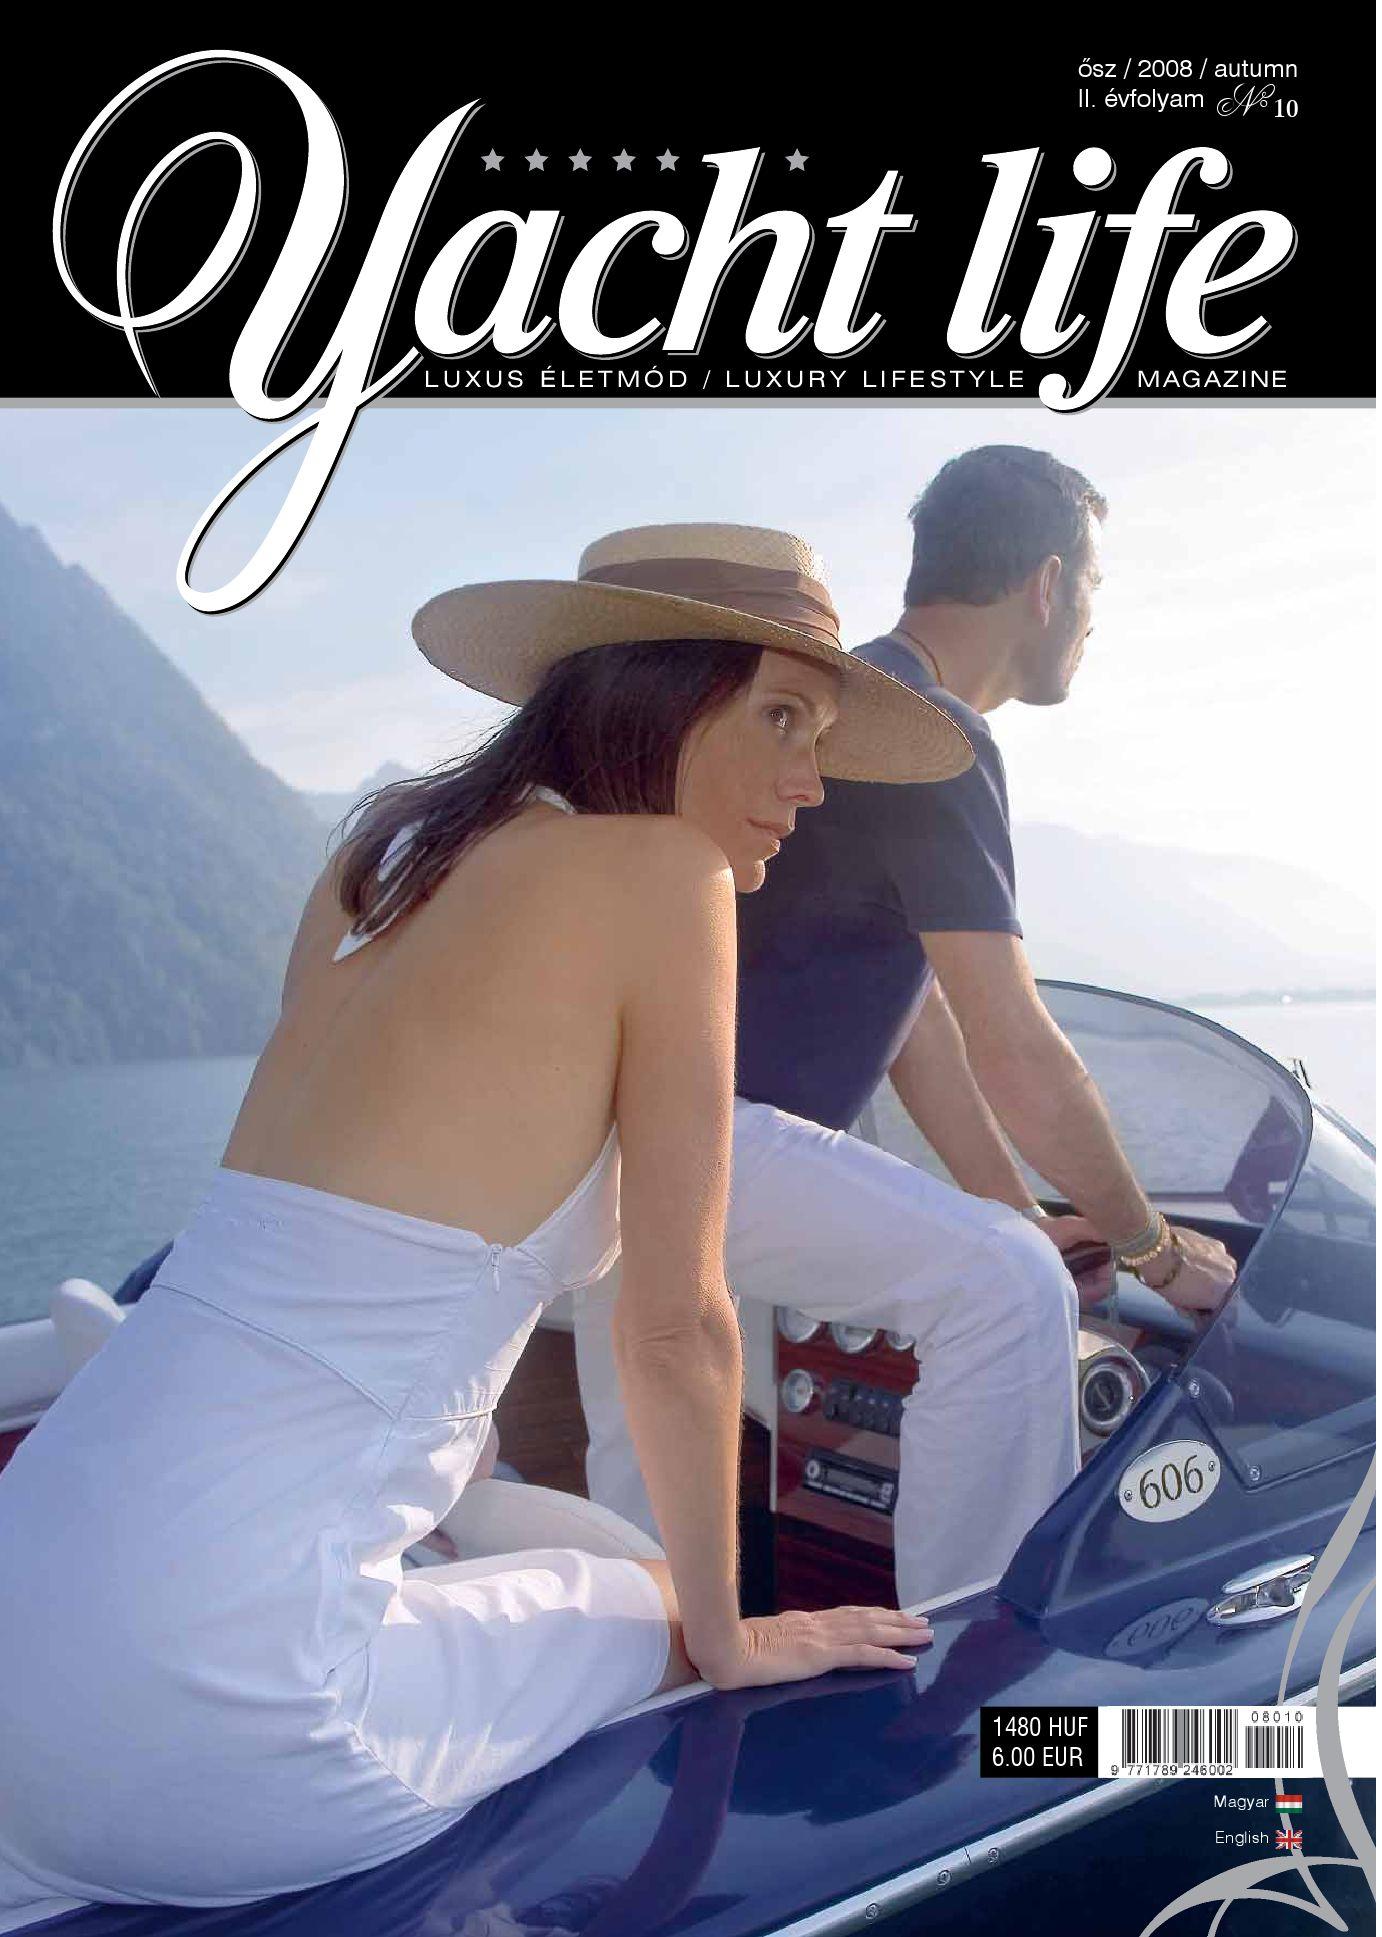 Yacht Life Magazin 0803 by Szabolcs Tar - issuu 64667c9acc